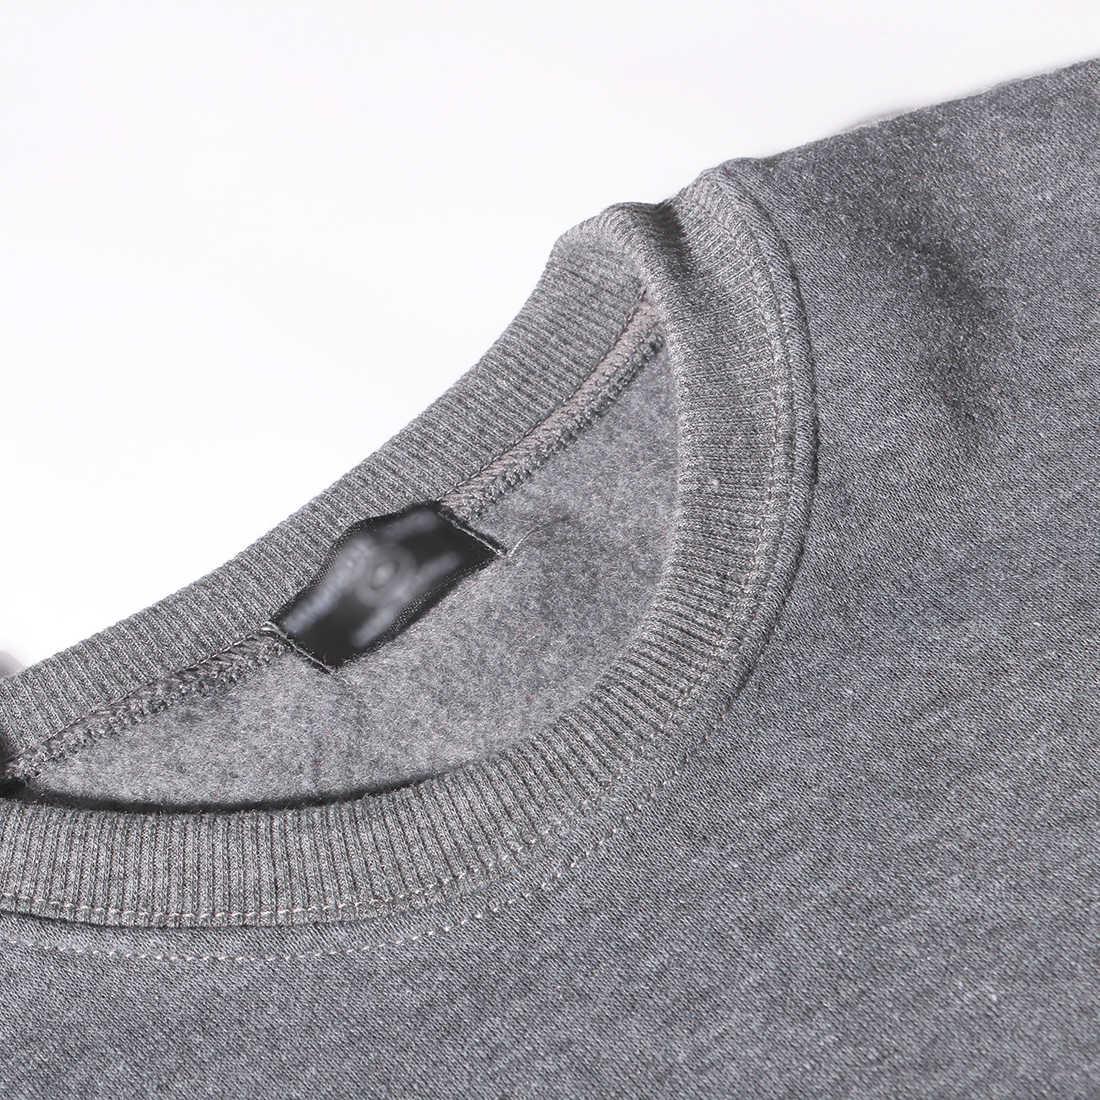 Mens Superhero Printing Hoodie 2020 가을 패션 의류 하라주쿠 라운드 넥 남성 레저 풀오버 Streetwear Spring Homme